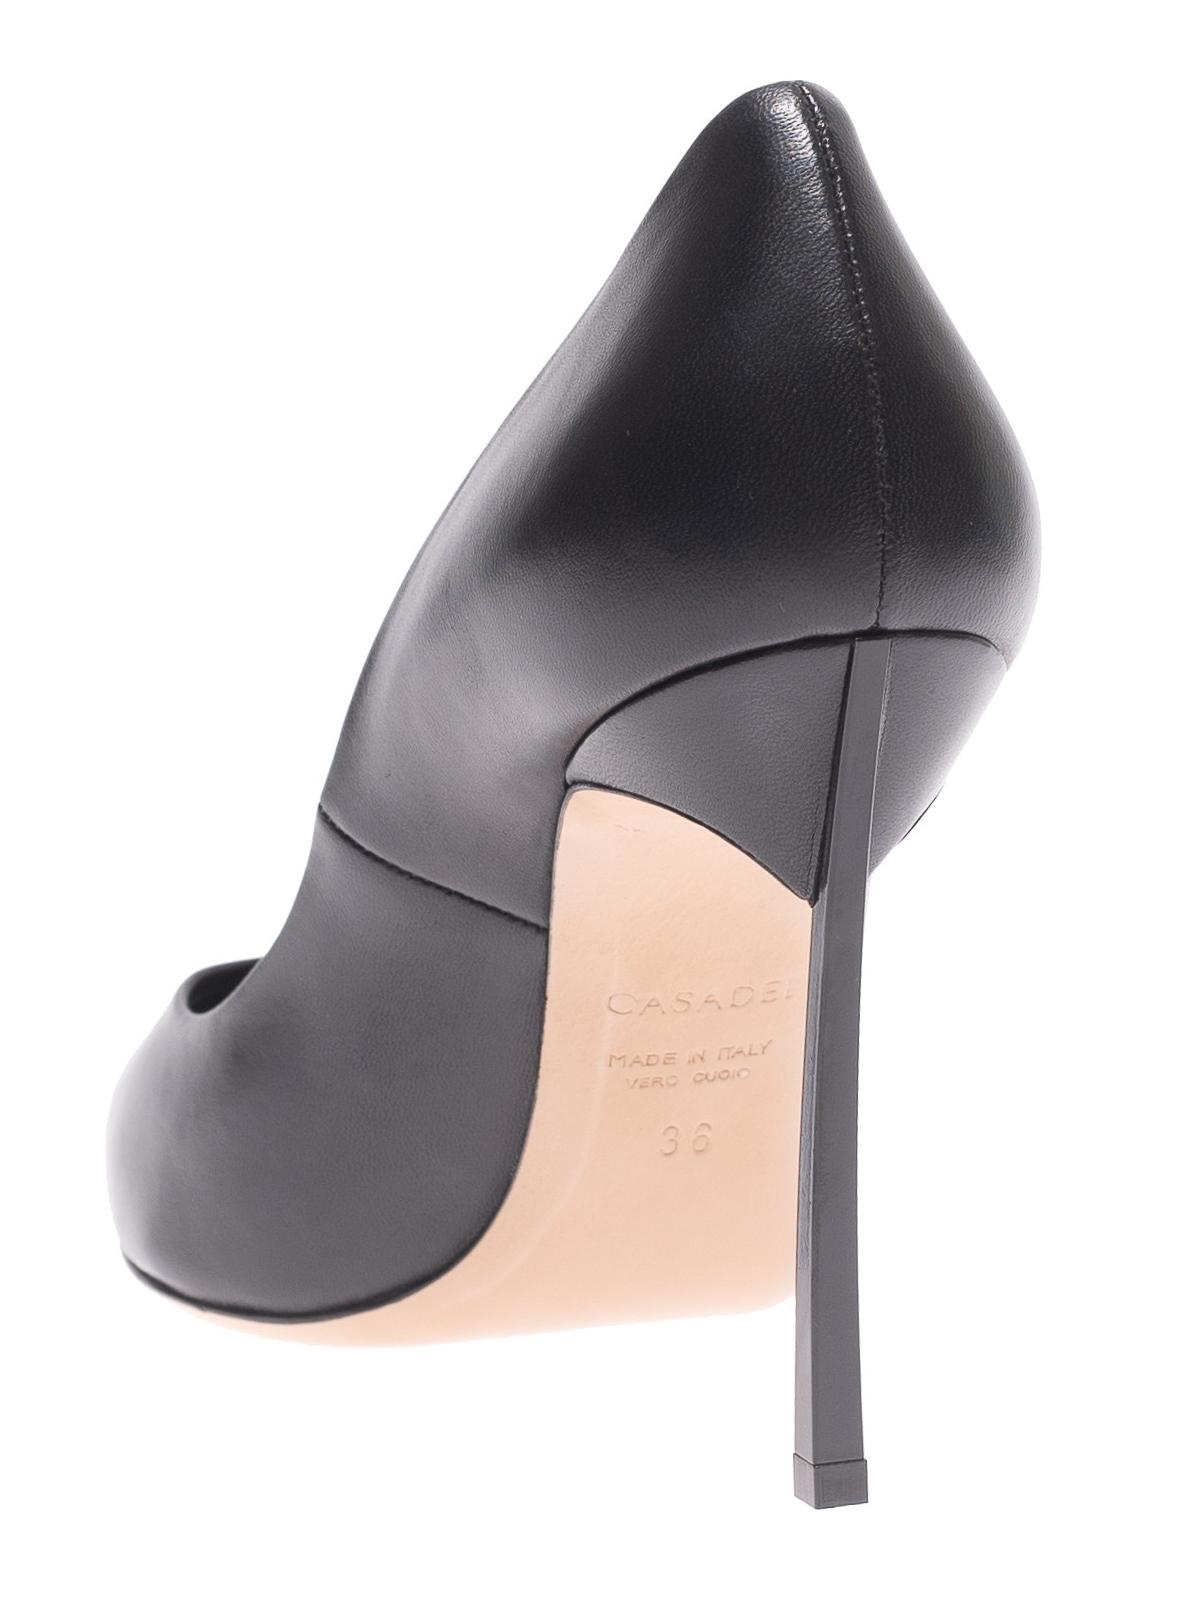 Casadei - Décolleté nere Duse in pelle con tacco Blade - scarpe ... c936c1a6e57